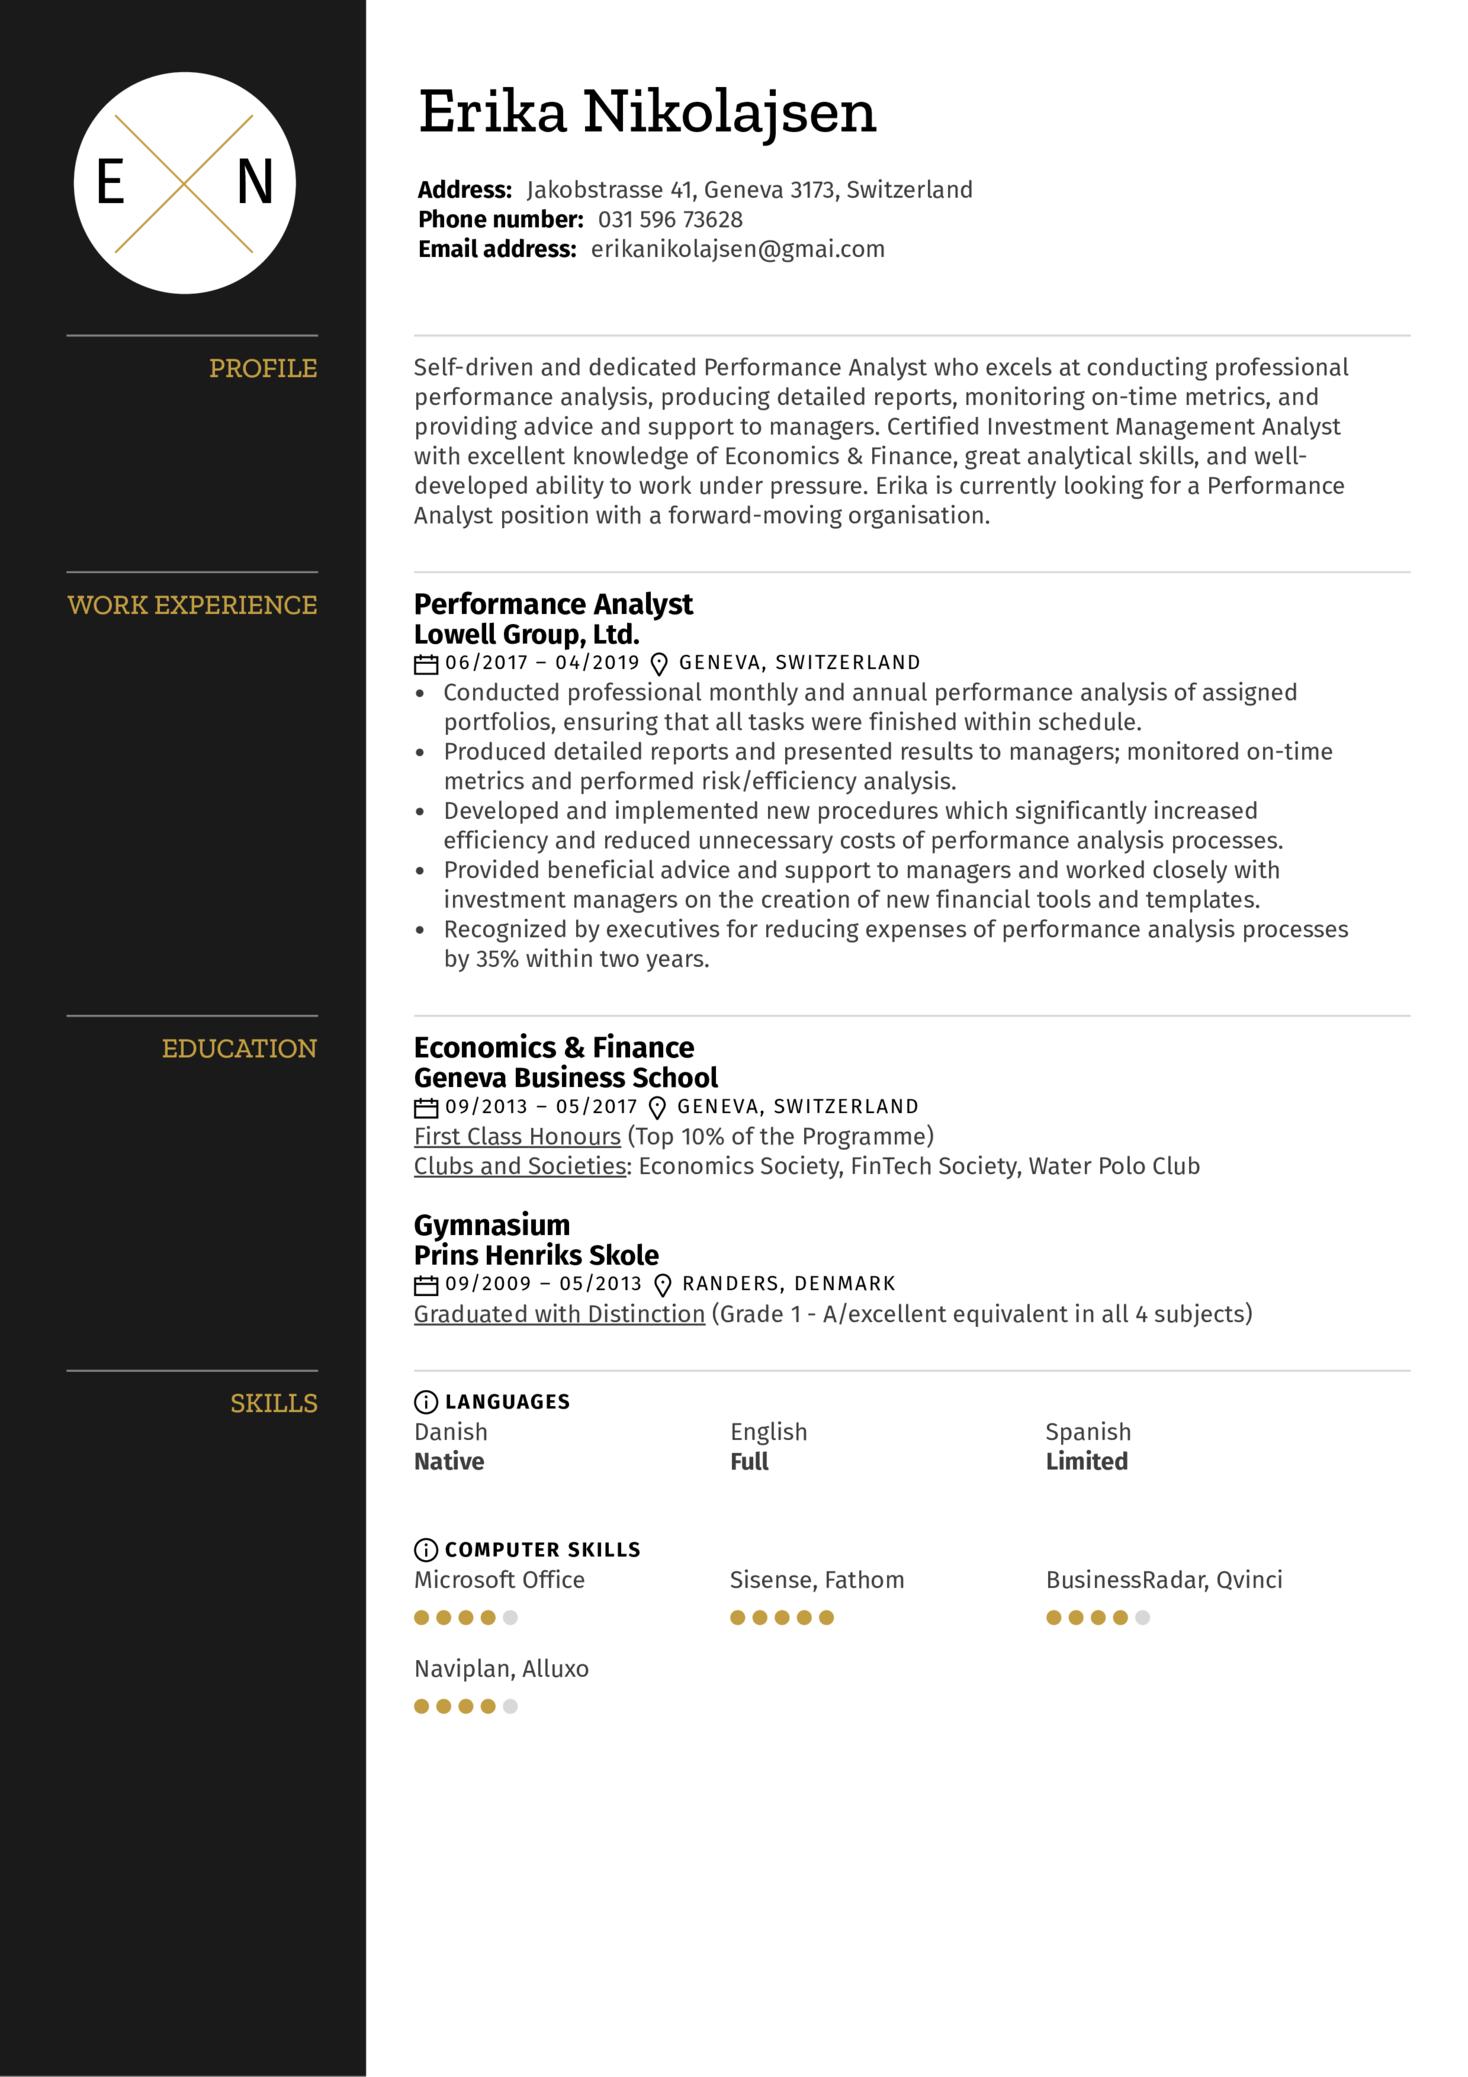 Performance Analyst Resume Sample (Part 1)